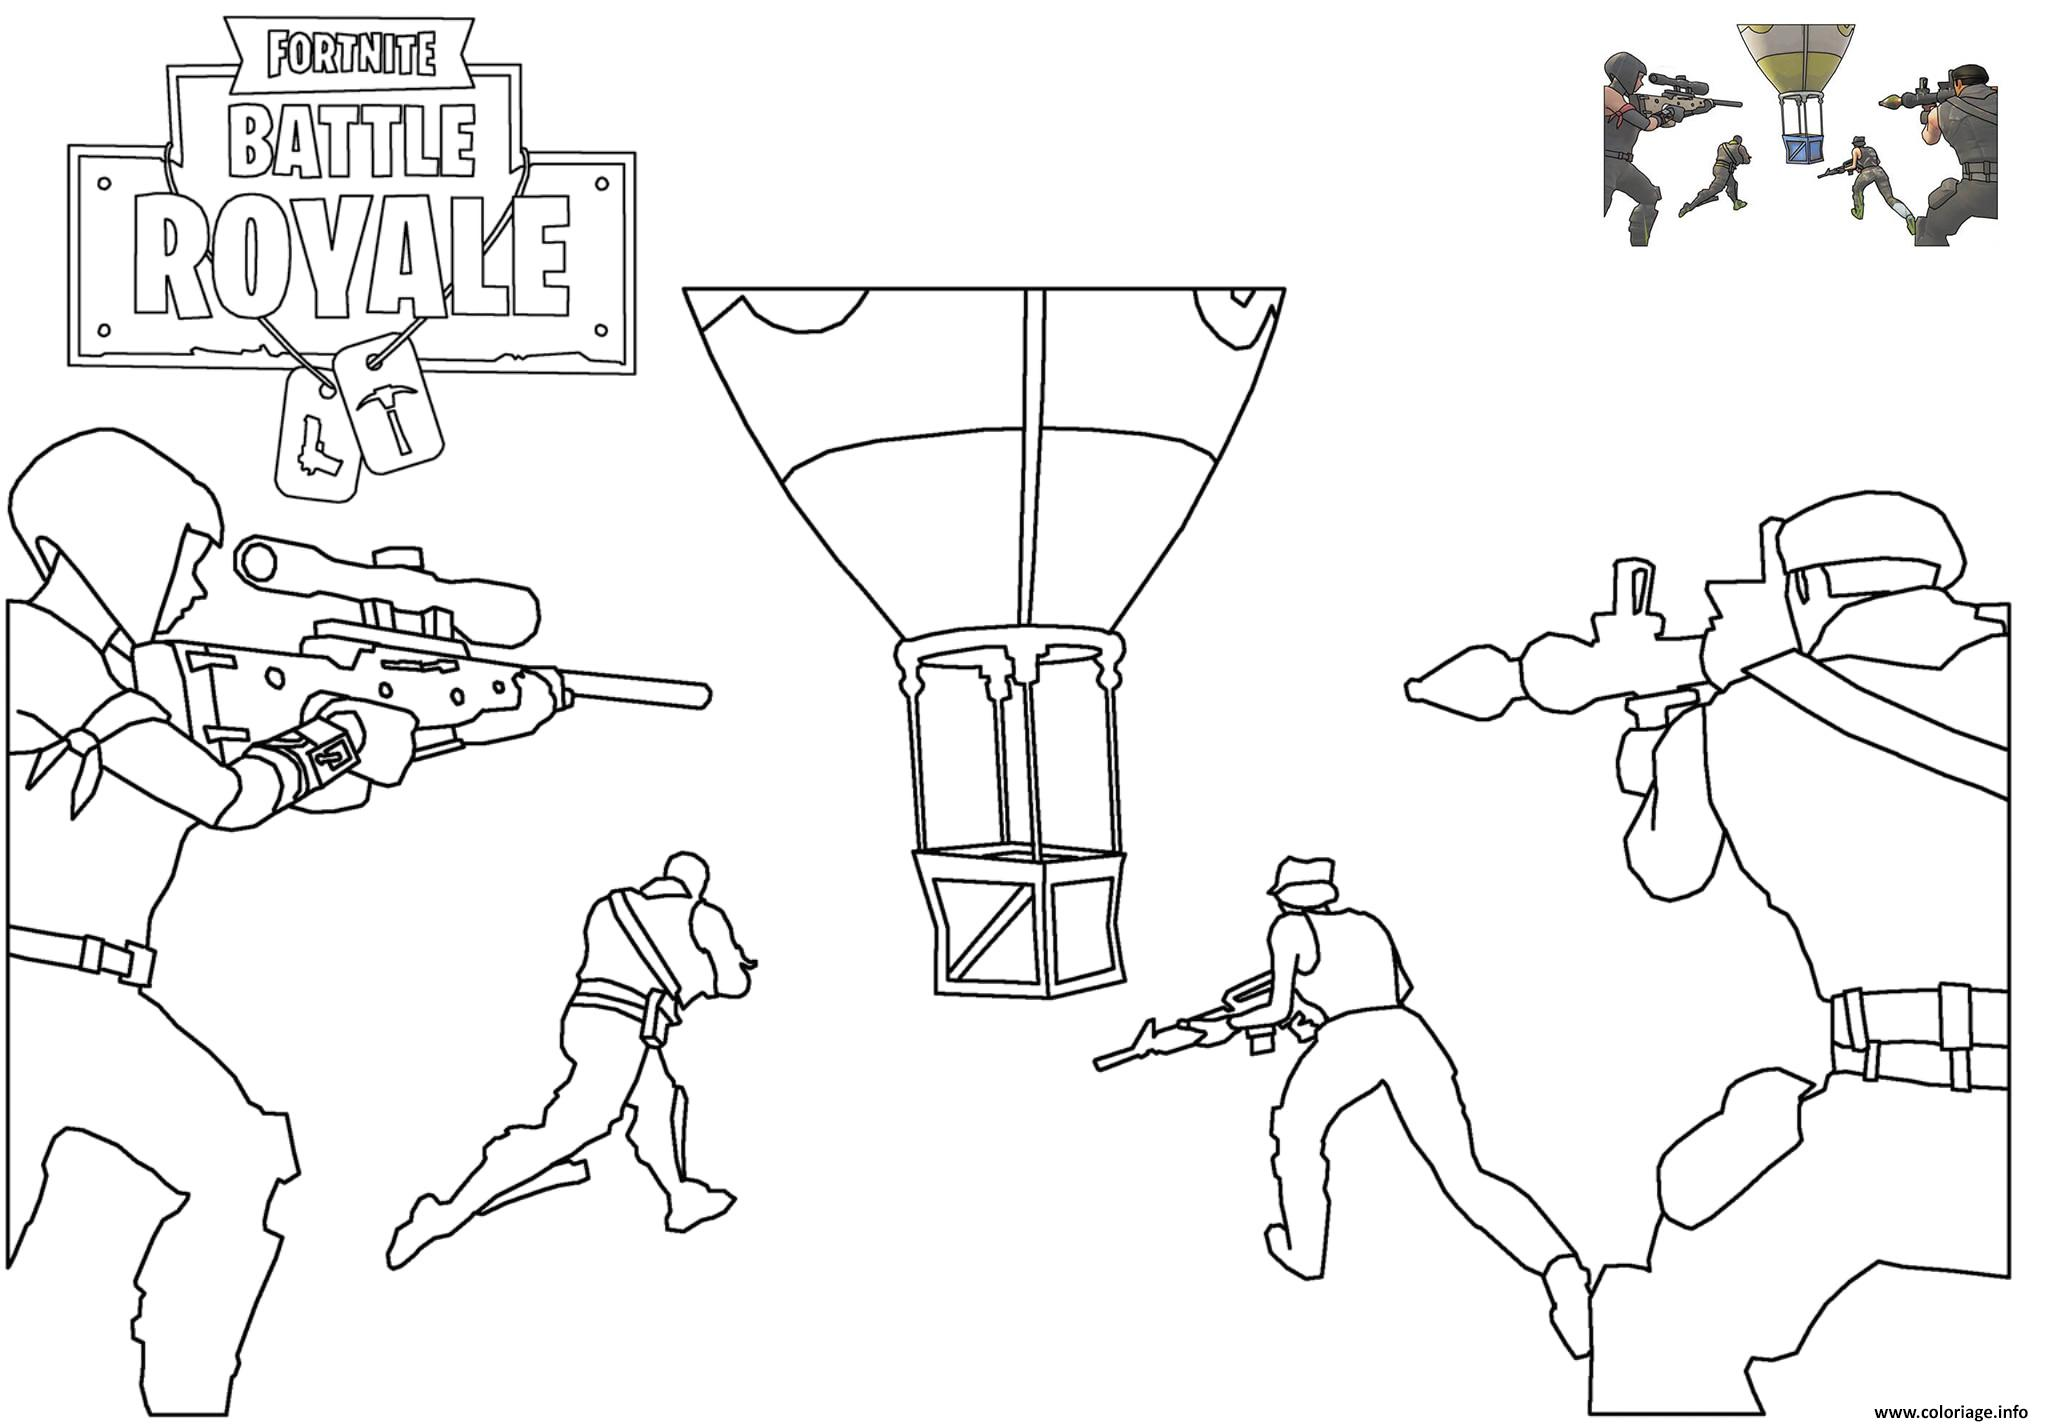 Coloriage Supply Drop Fortnite Battle Royale Dessin